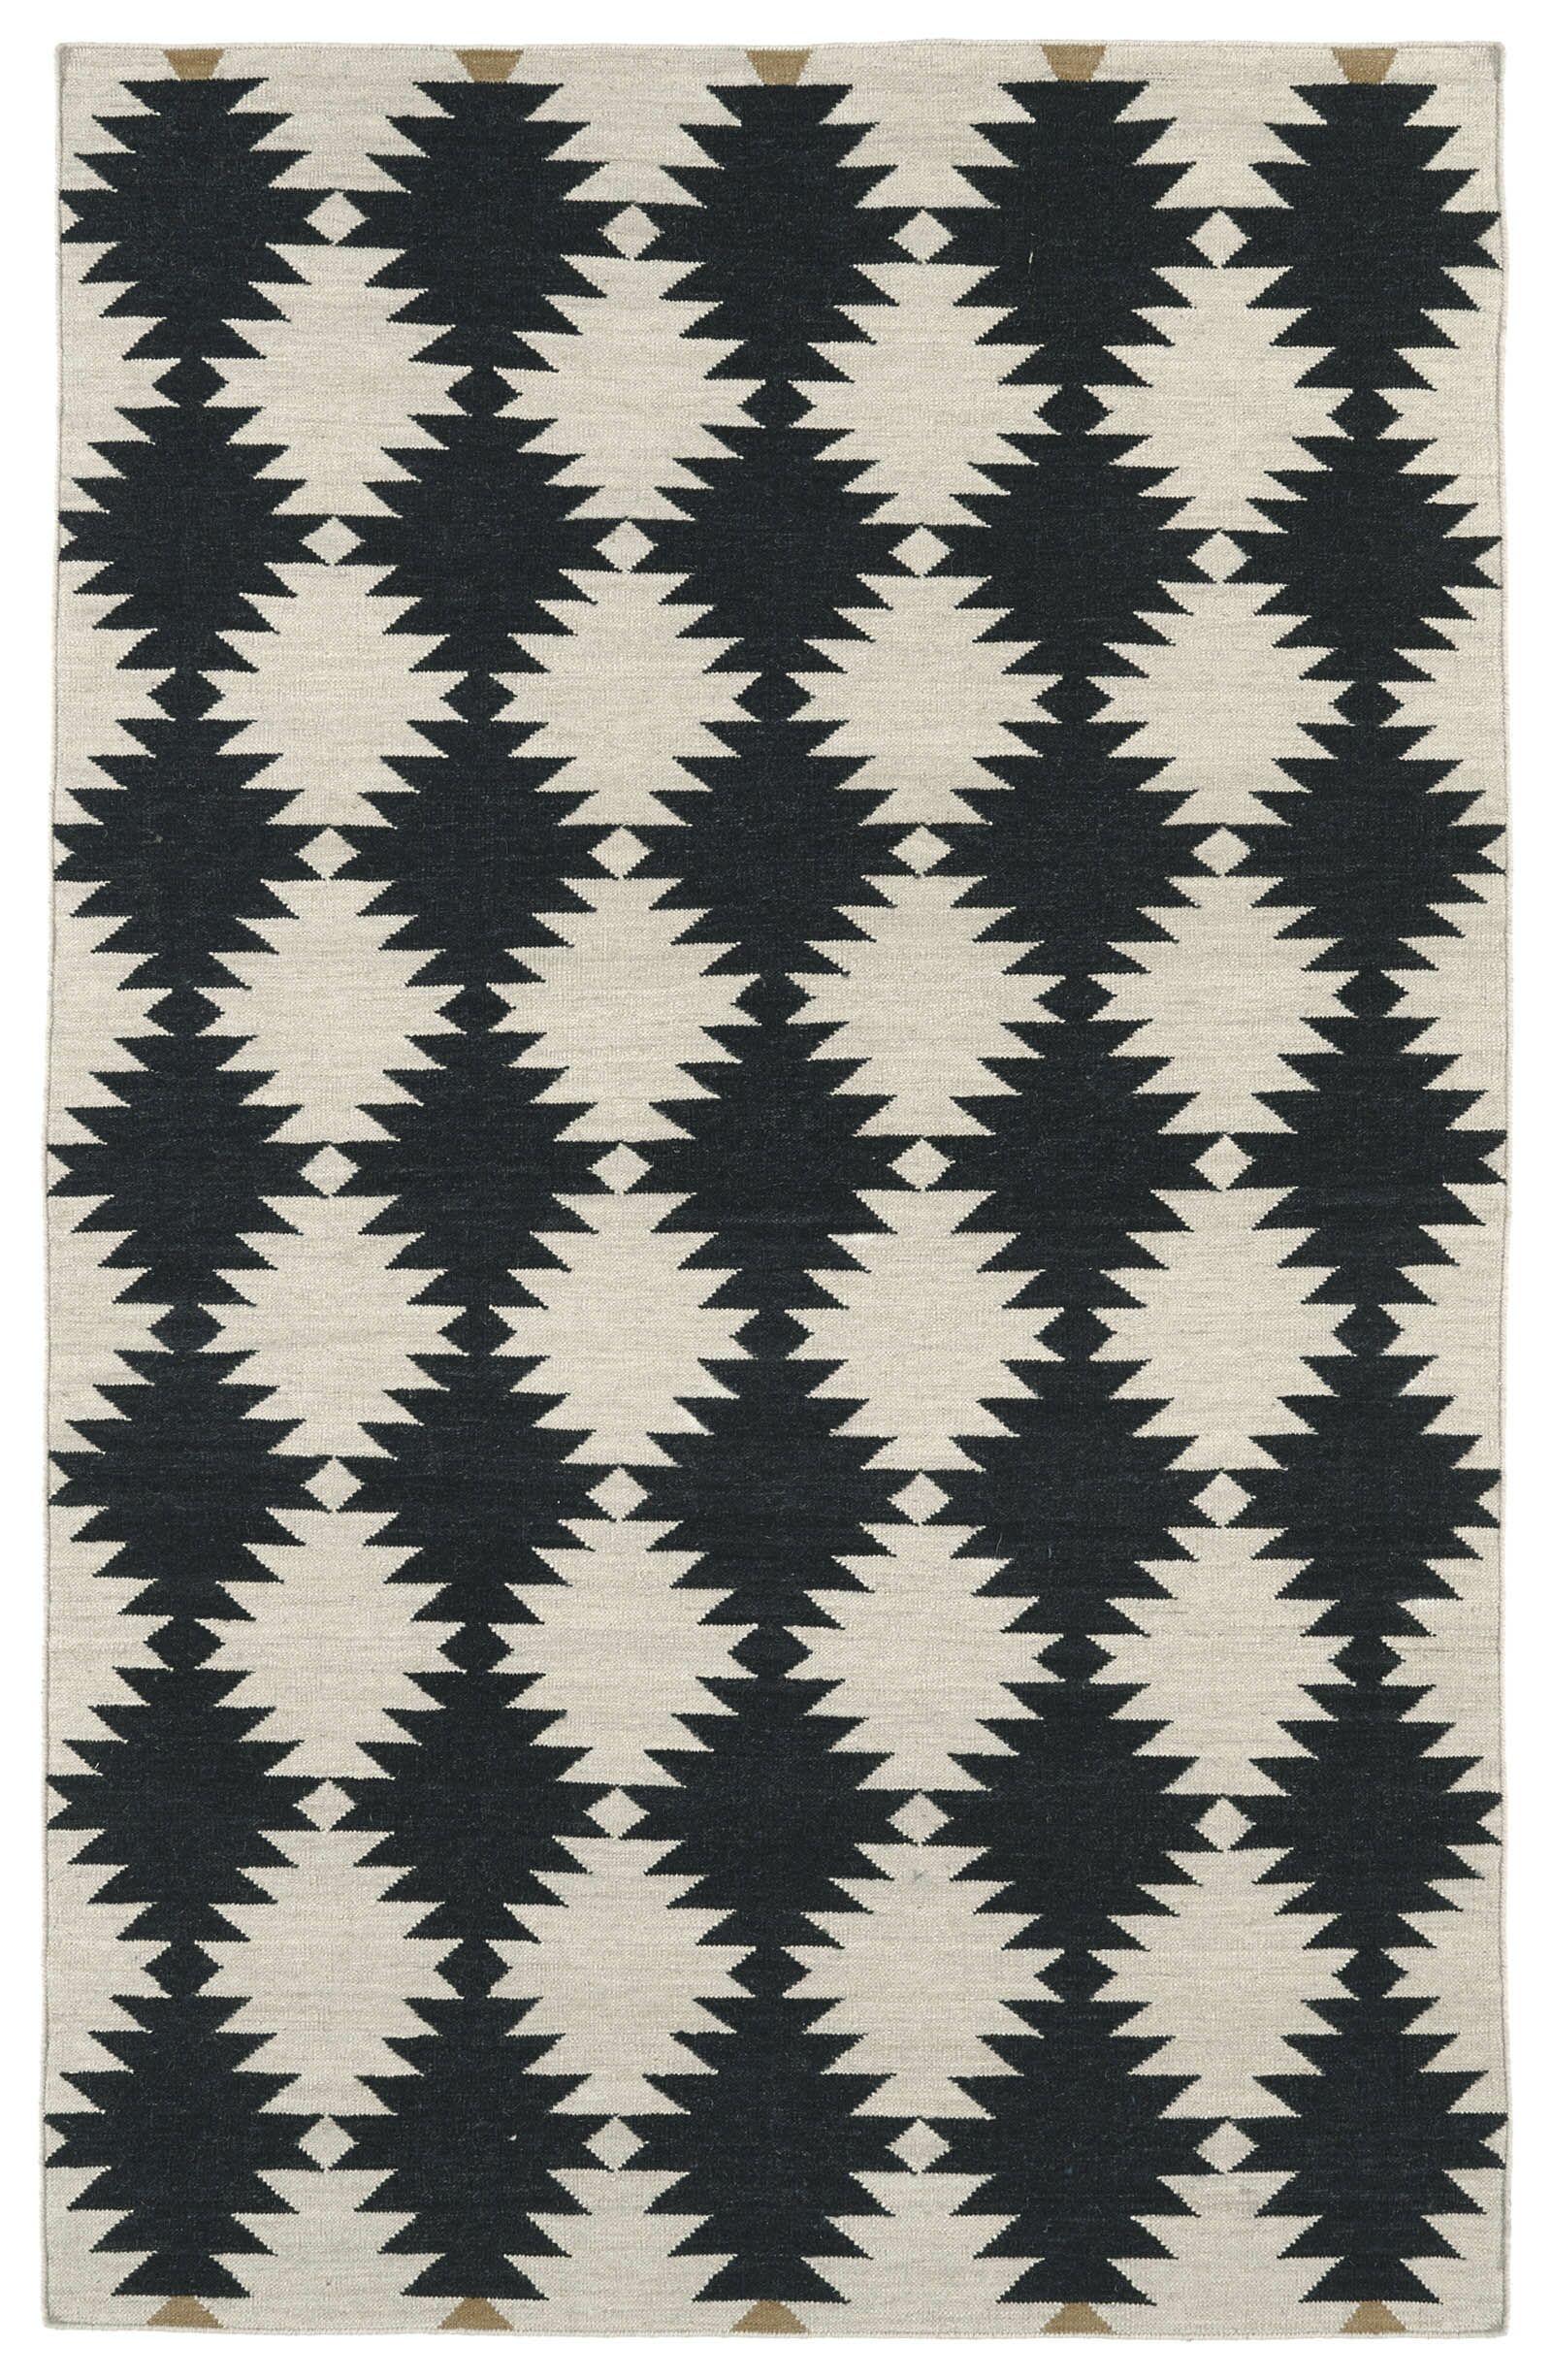 Marble Falls Black & Cream Geometric Area Rug Rug Size: Rectangle 8' x 10'